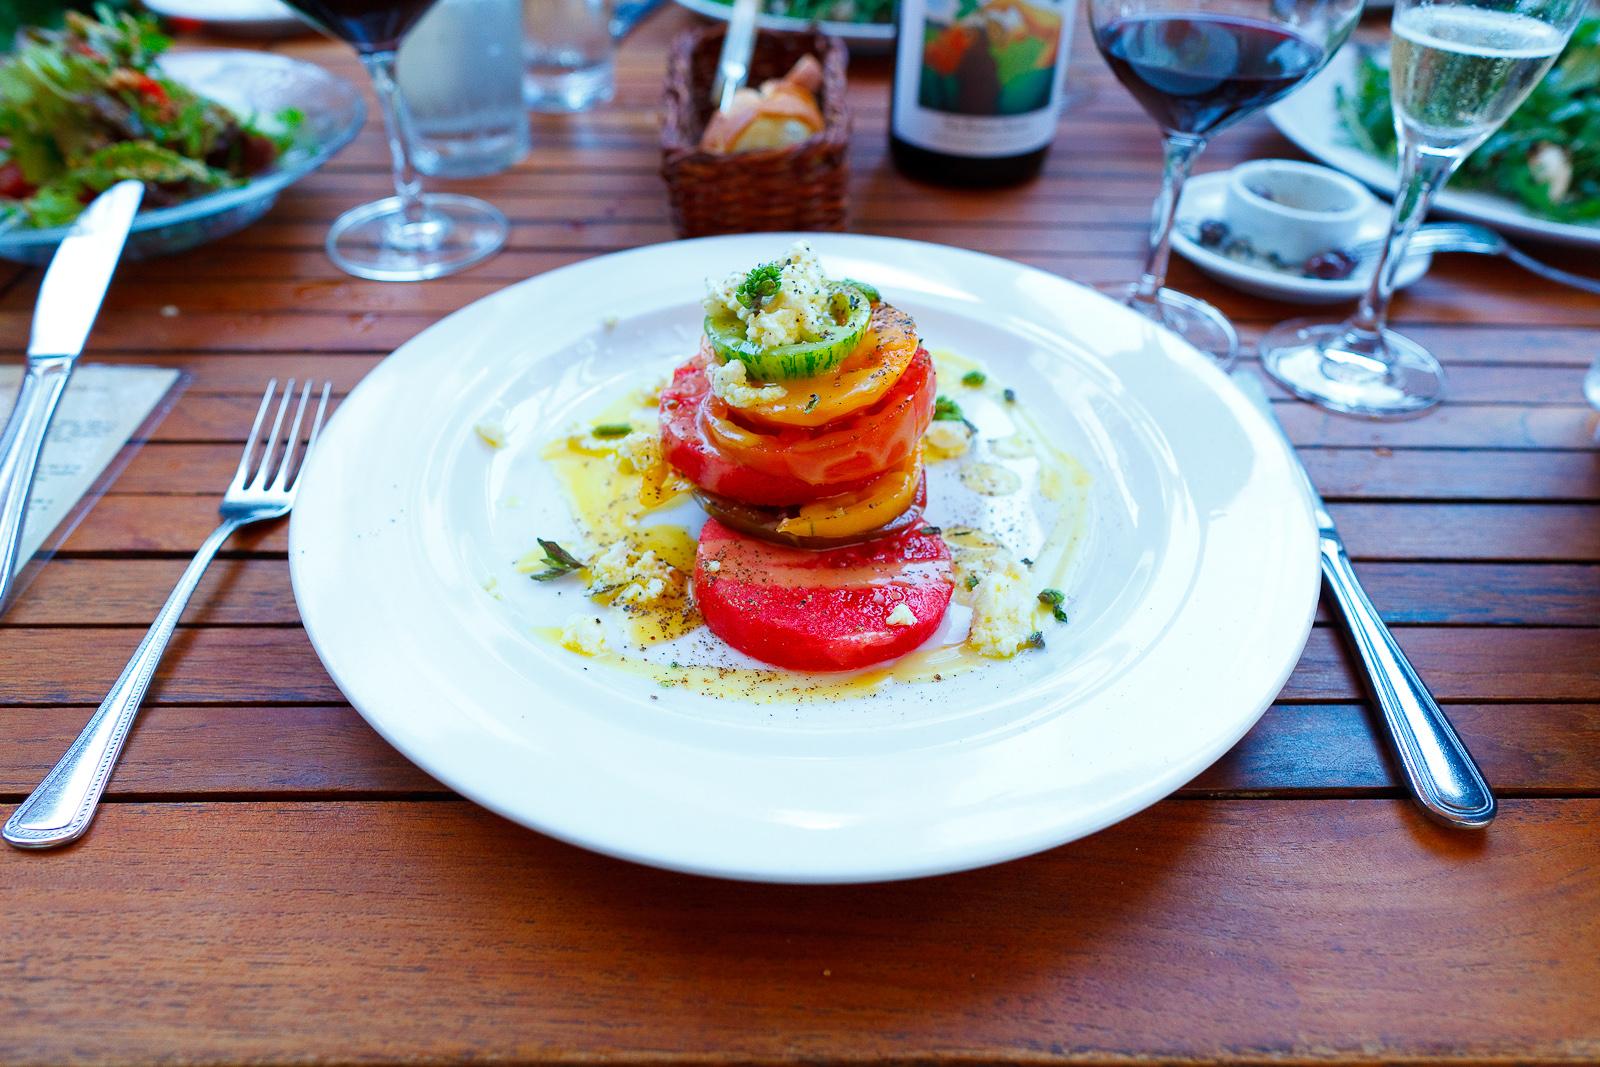 Heirloom summer tomato & watermelon saladmarinated feta, yellow tomato vinaigrette ($12)